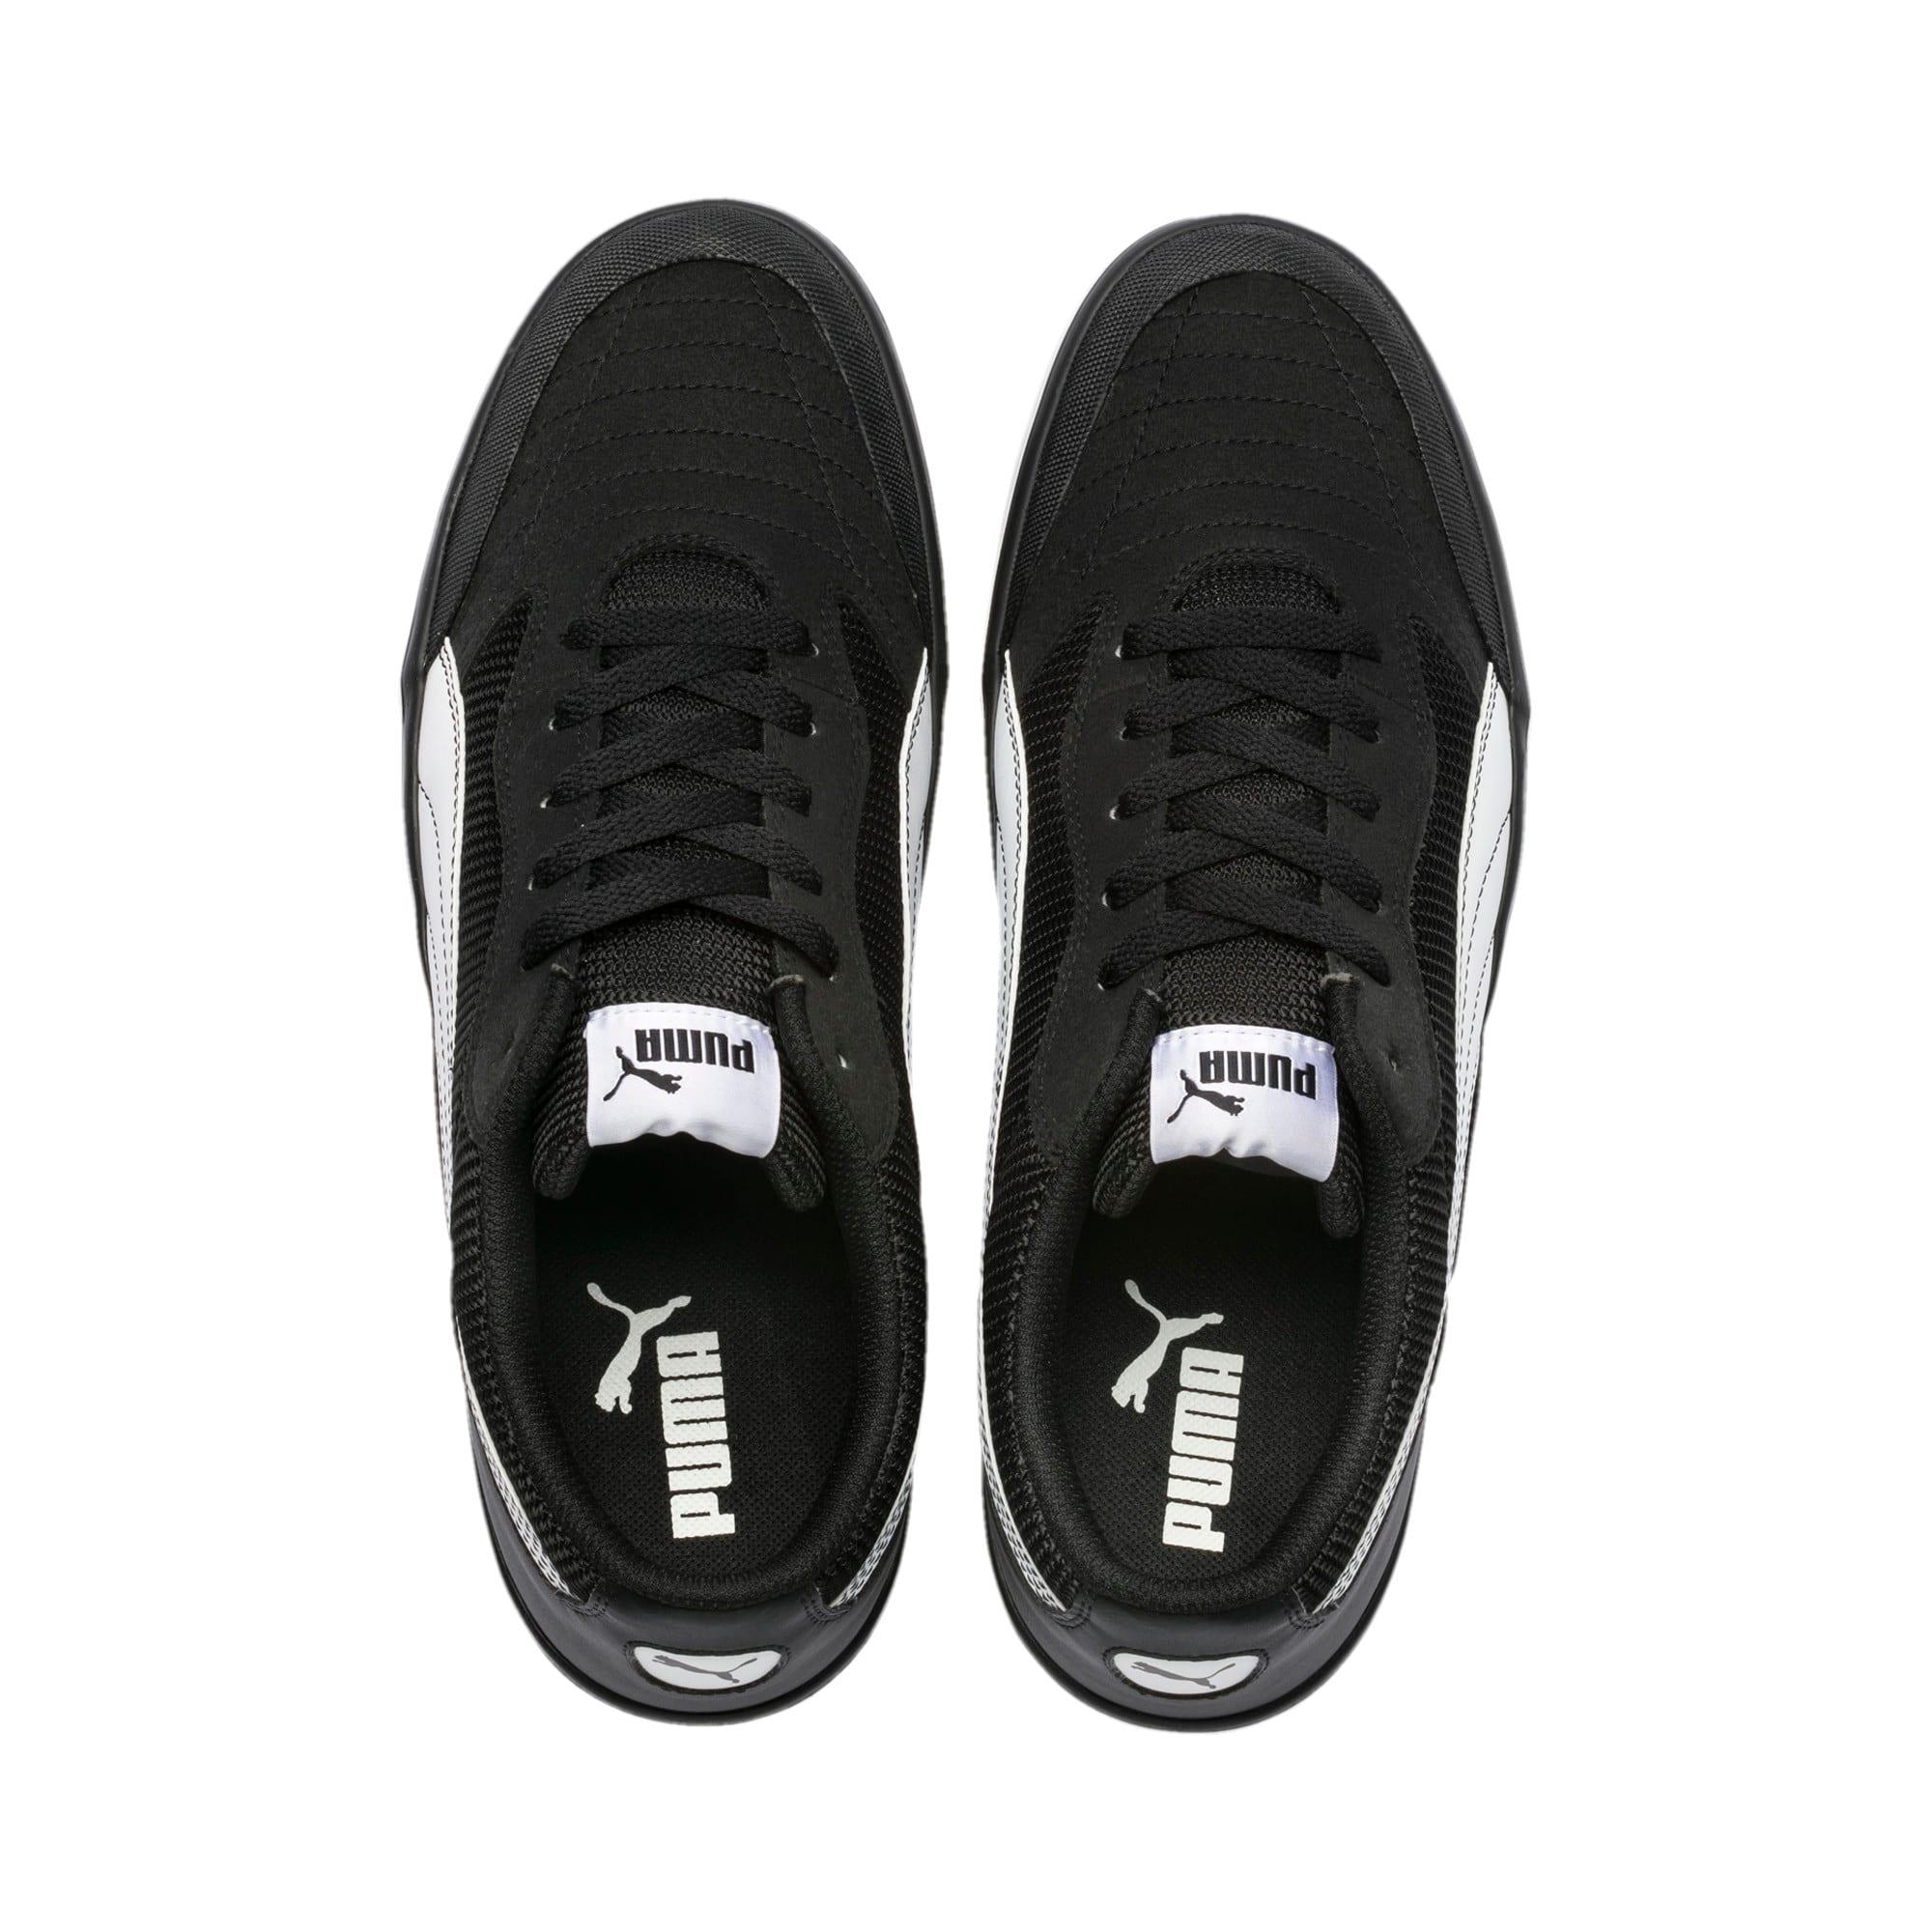 Thumbnail 6 of Astro Sala Sneakers, Puma Black-Puma White, medium